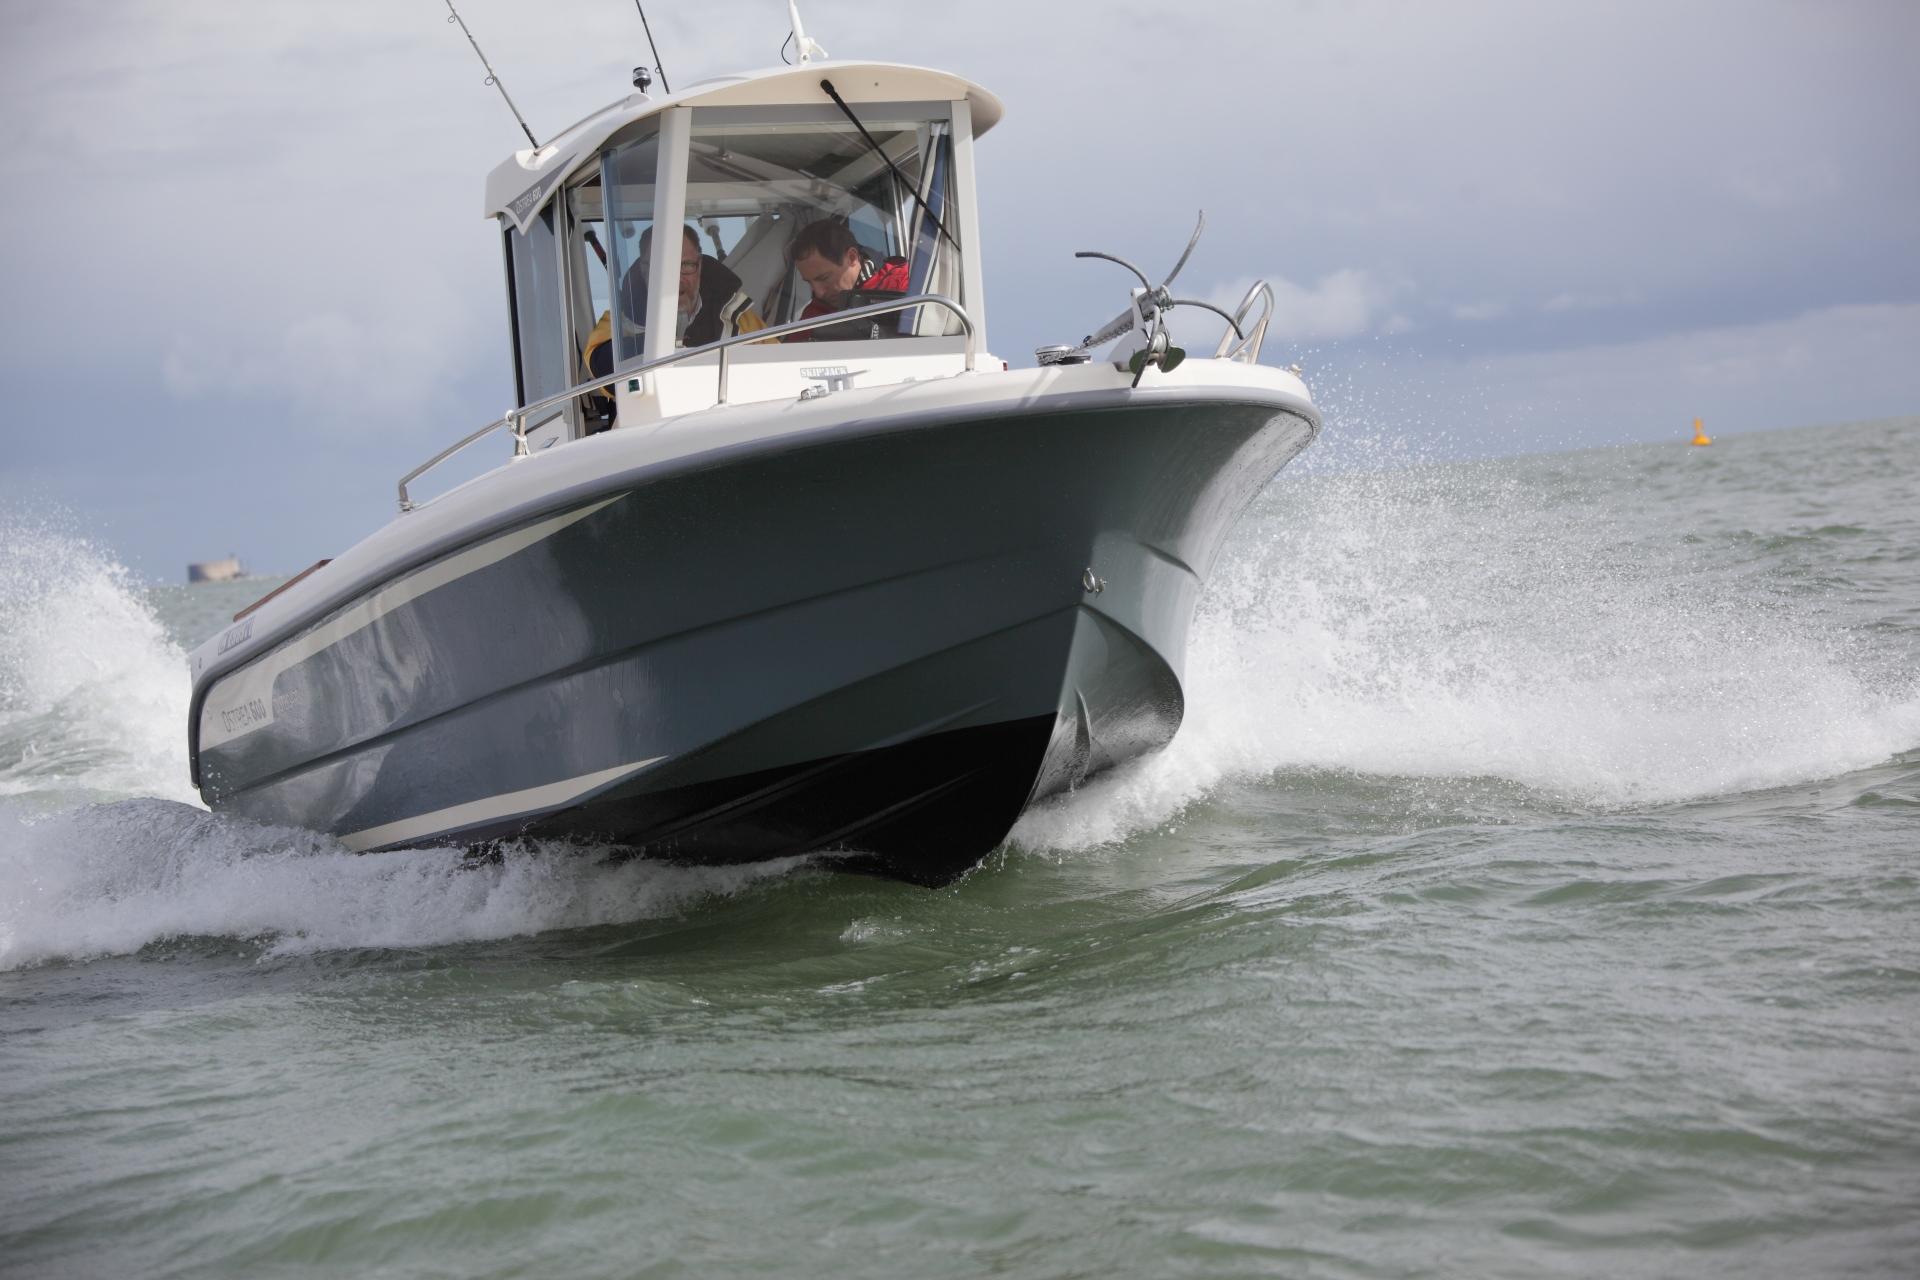 bateau peche 6 metre